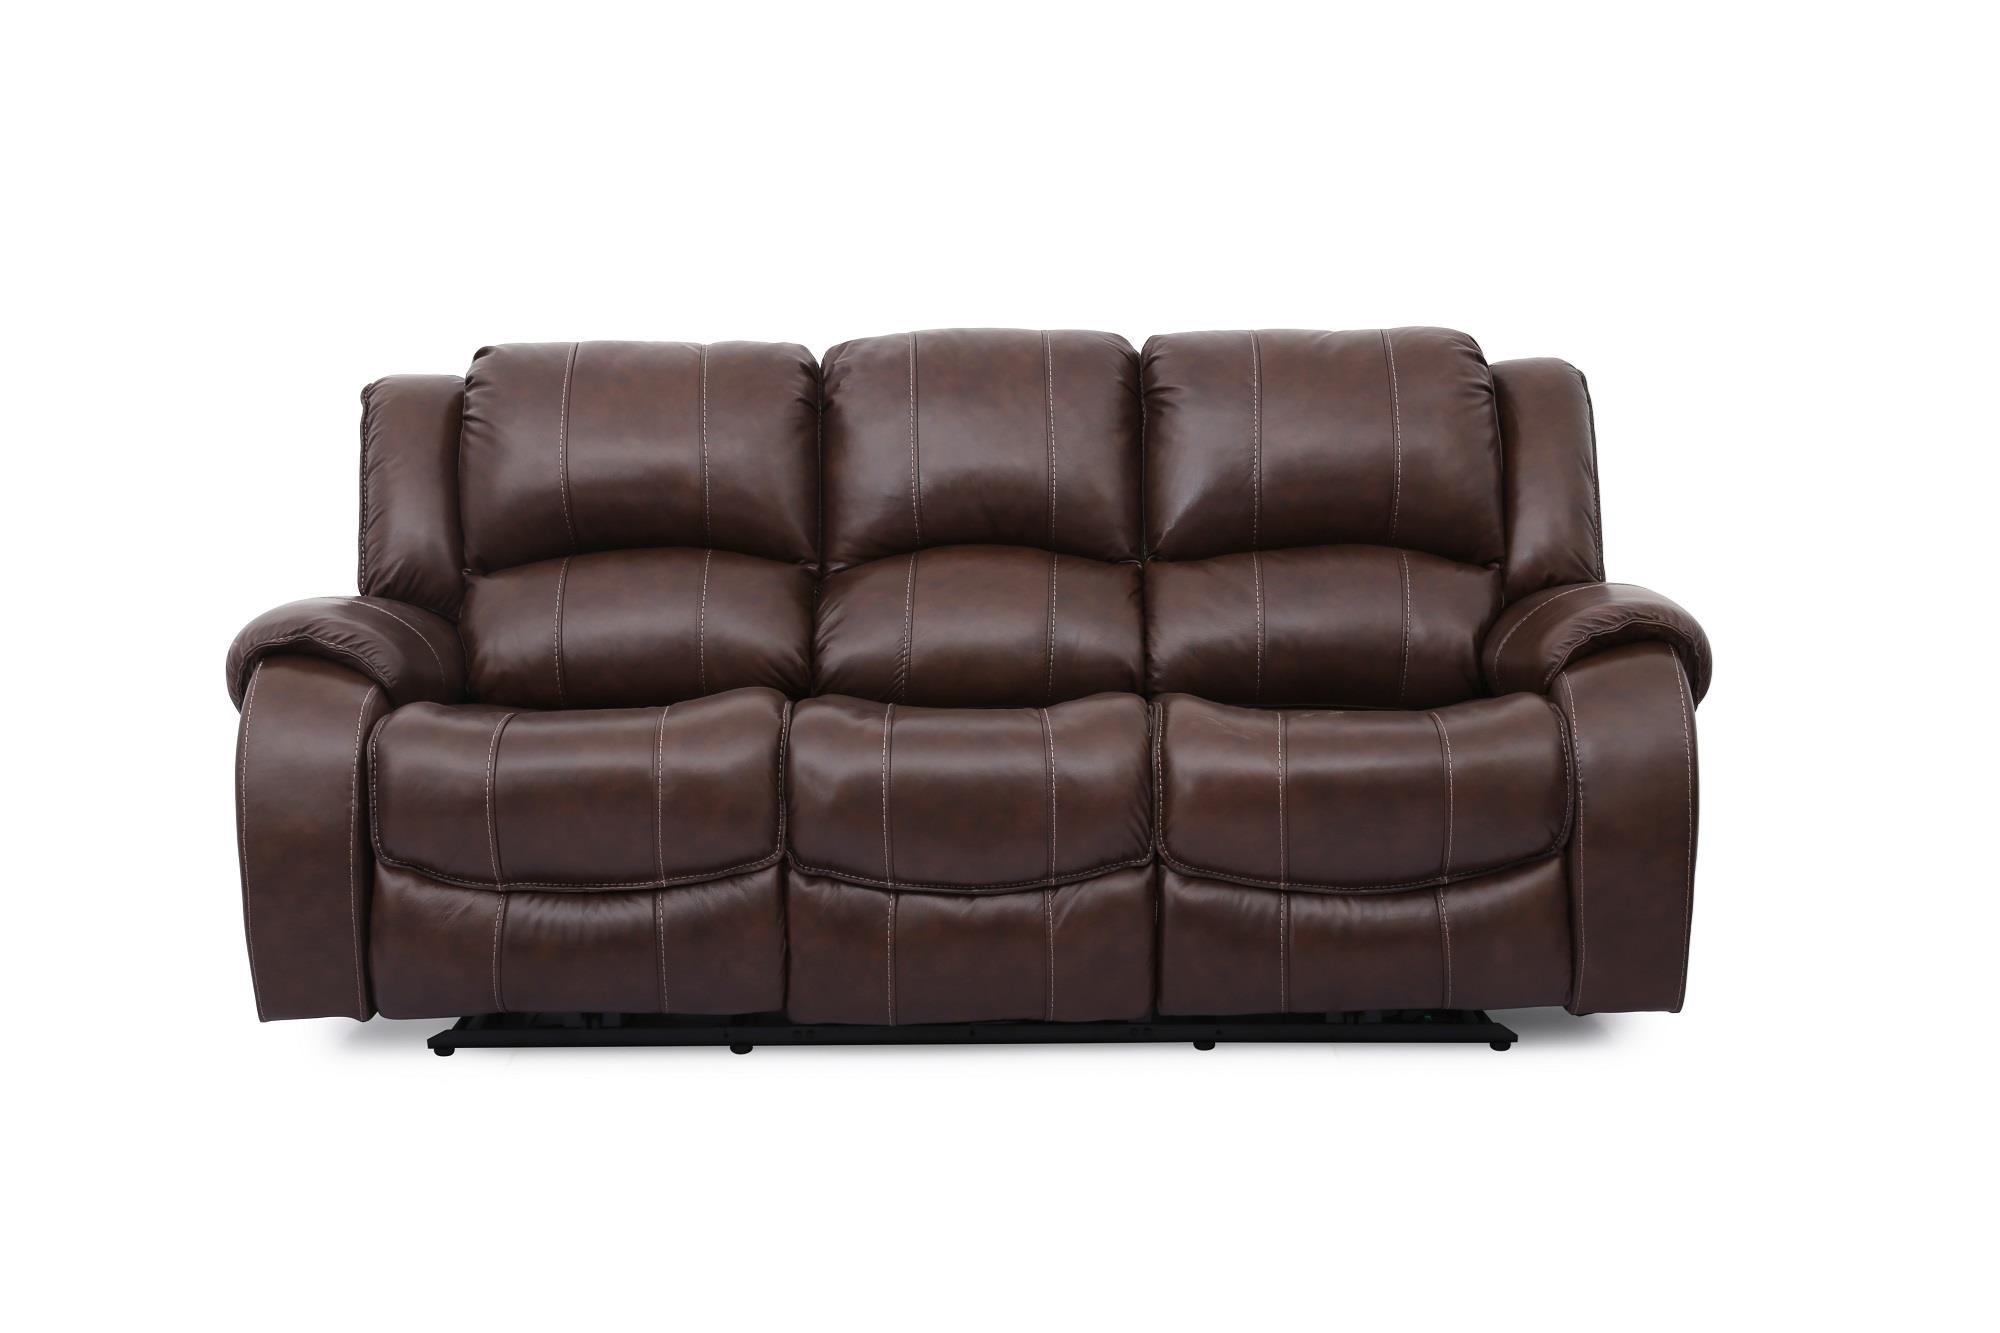 sofaore knoxville tn 5503 ilford road sofala cheers sofa ideas brown lthr pwr reclining w head